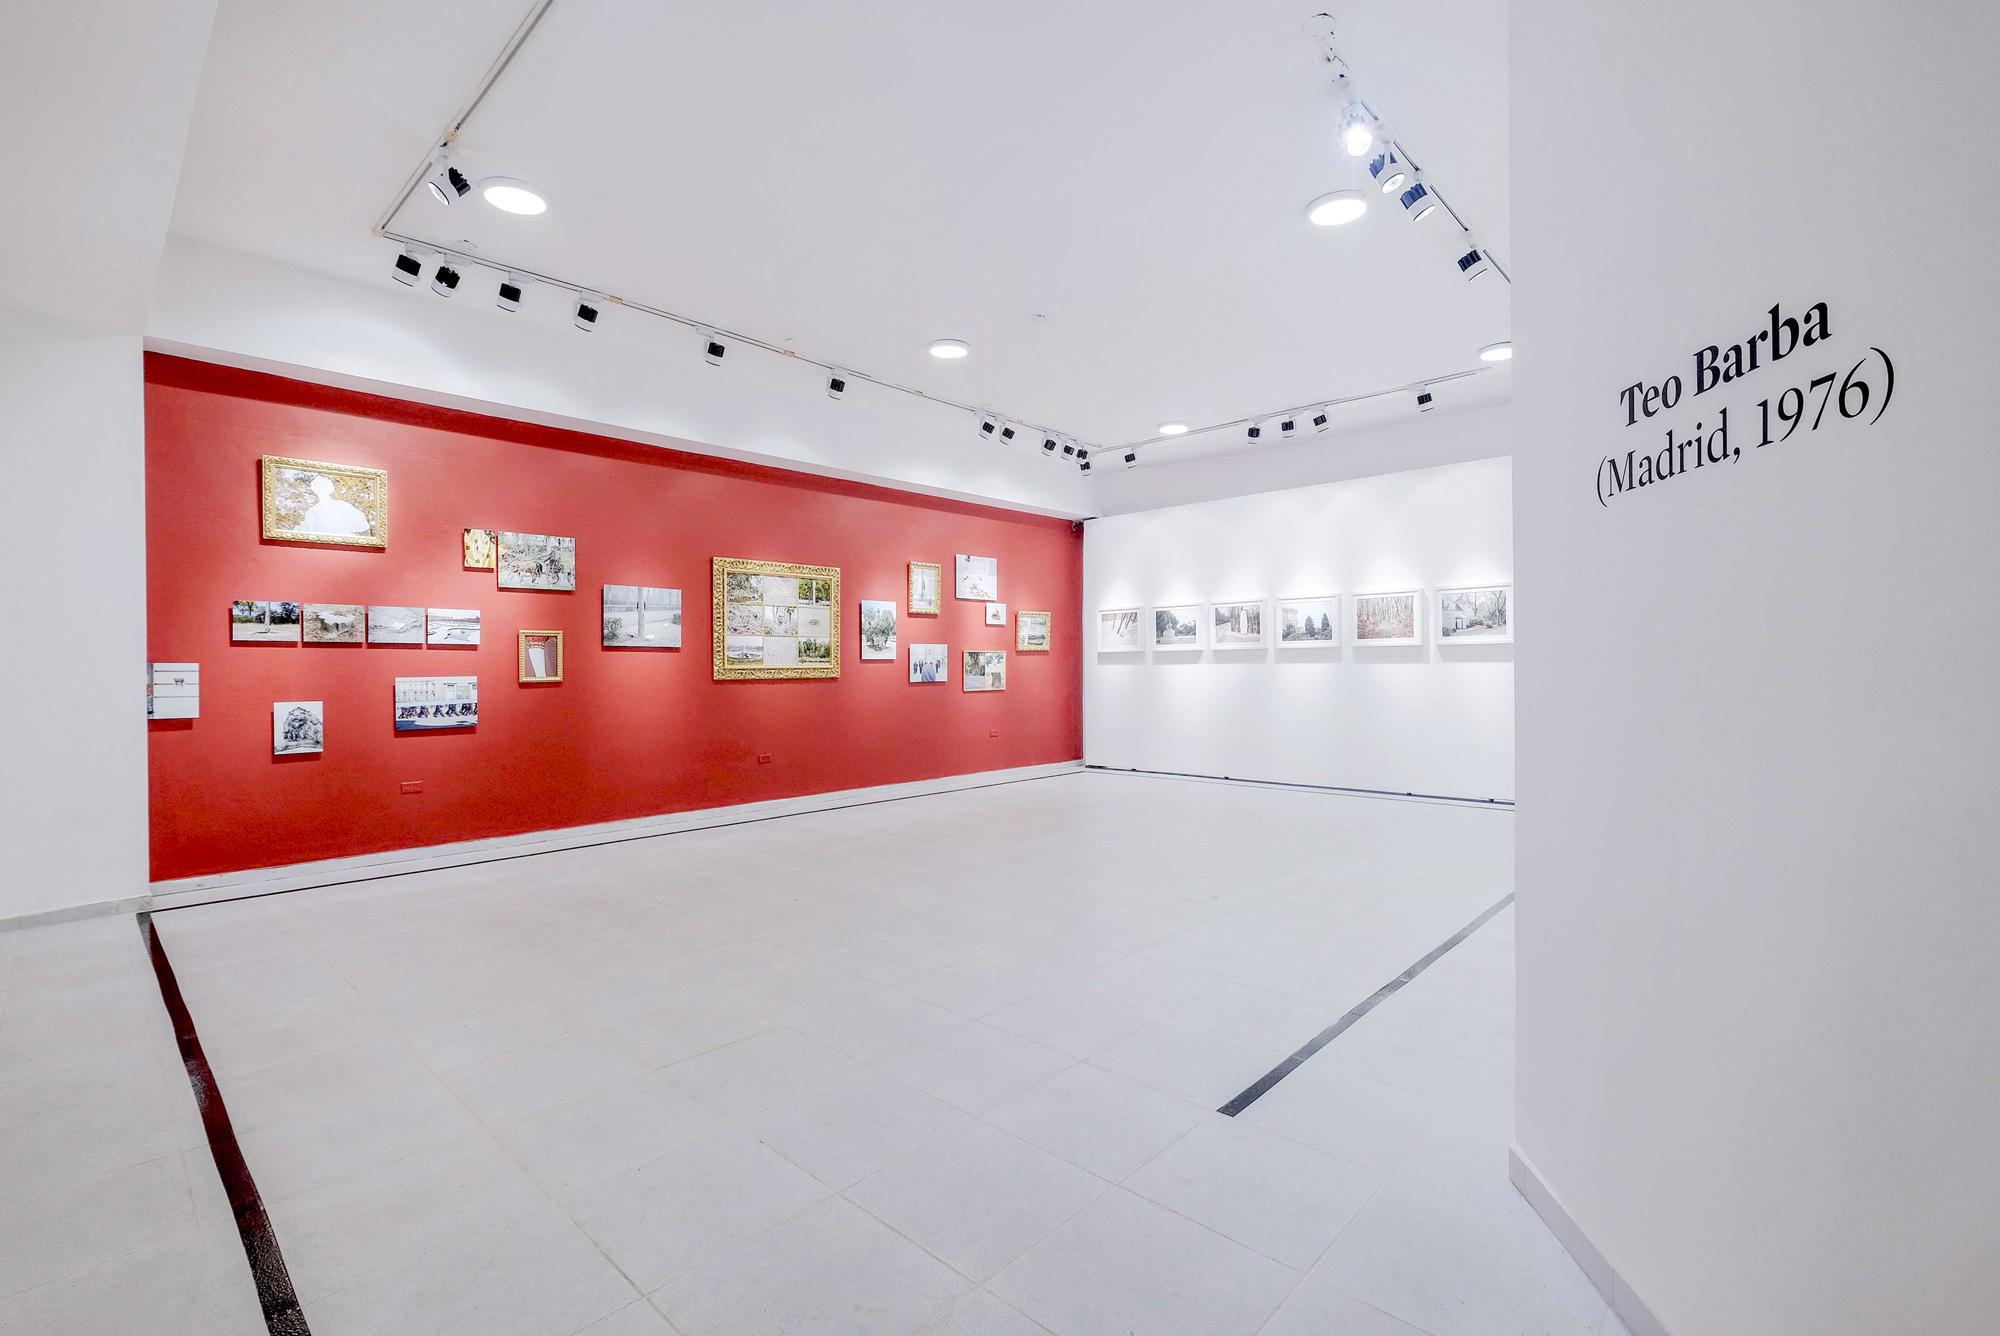 Museo-Cándido-Bidó_BONAO_REP-DOMINICANA